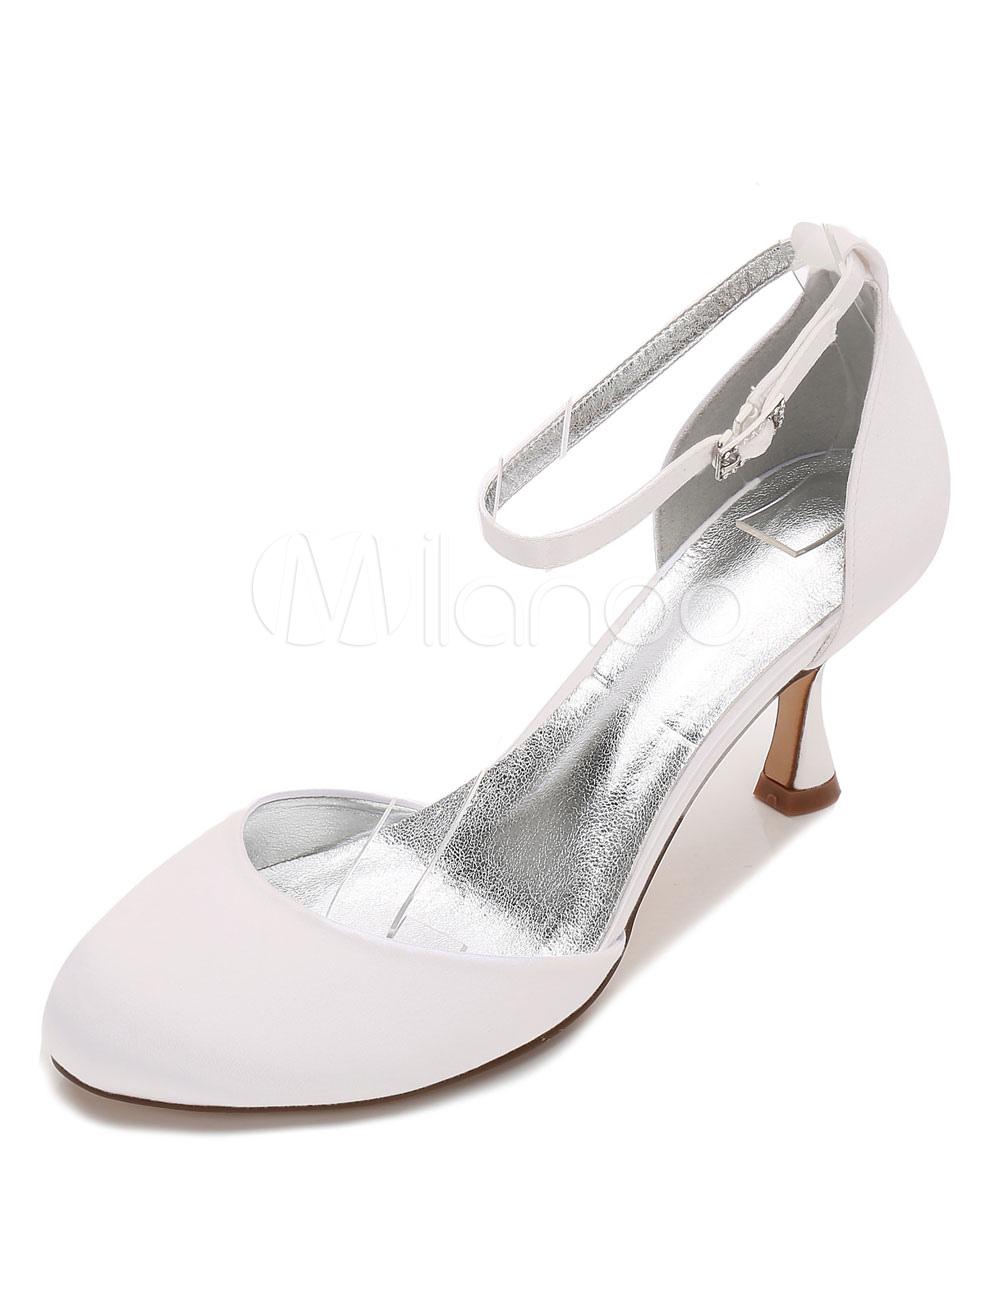 Zapatos de puntera redonda de tacón de kitten de seda y satén para boda Qgbj96